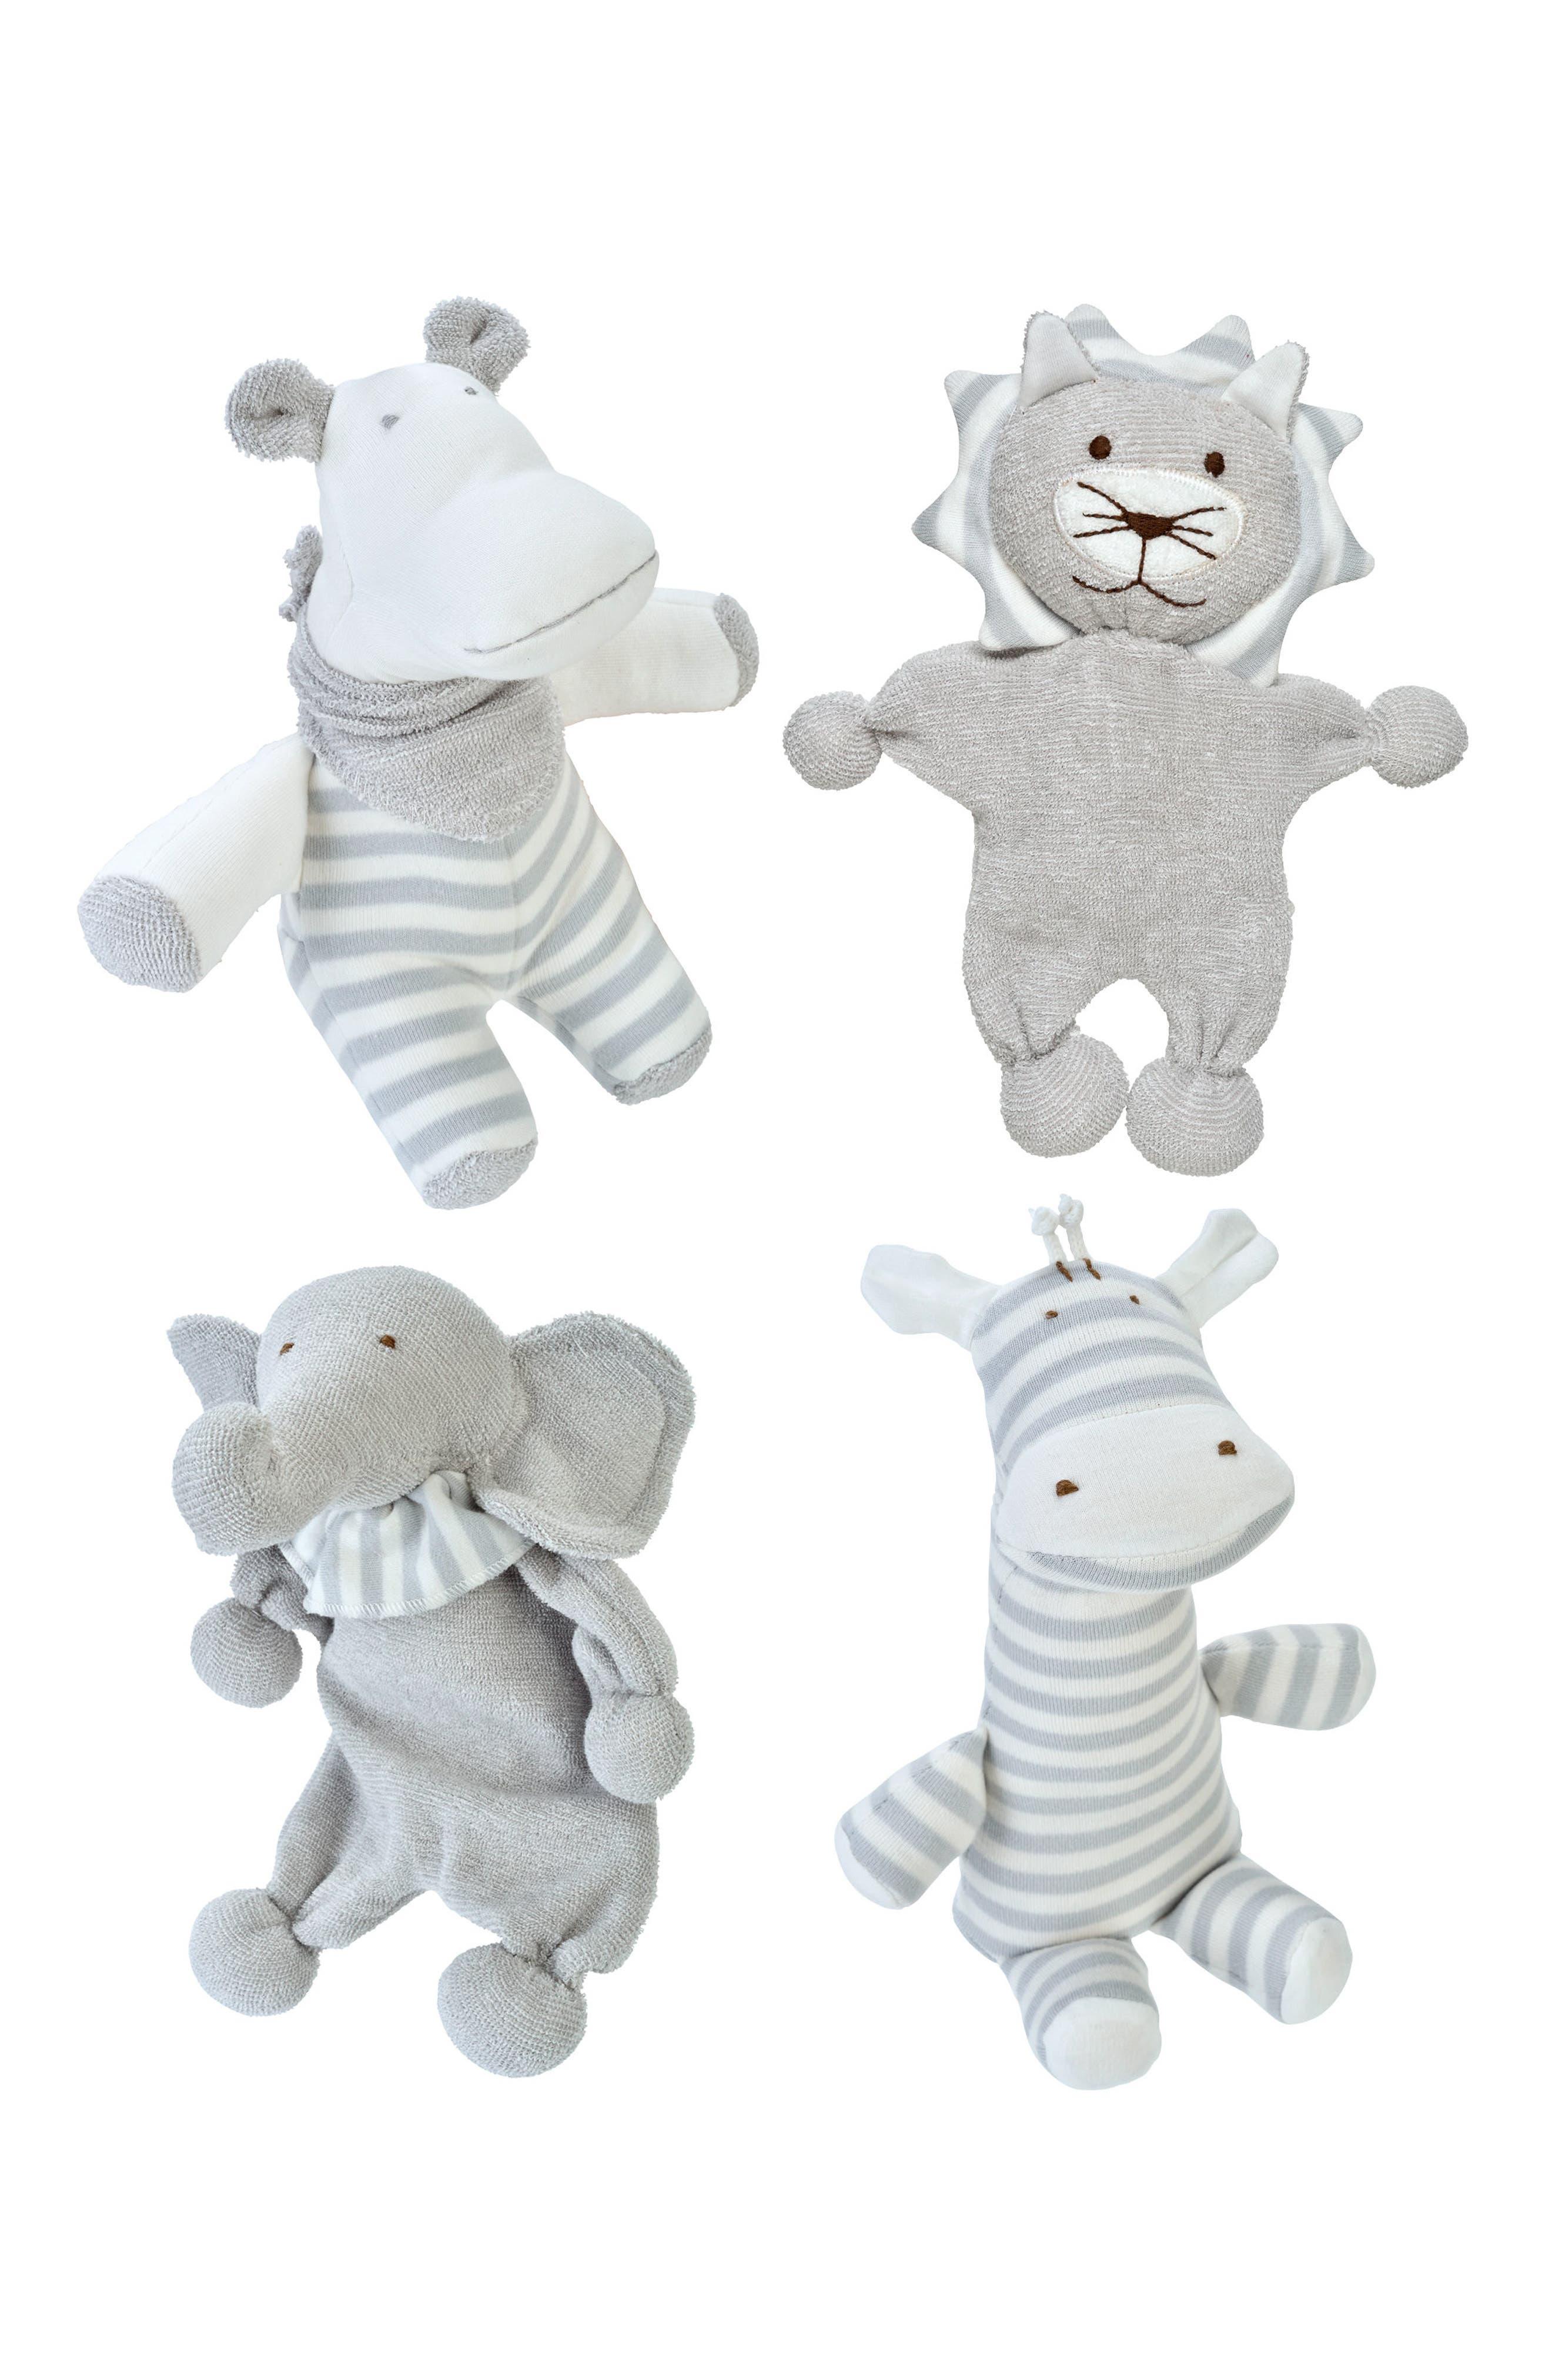 4-Piece Safari Stuffed Animal Set,                         Main,                         color, 021